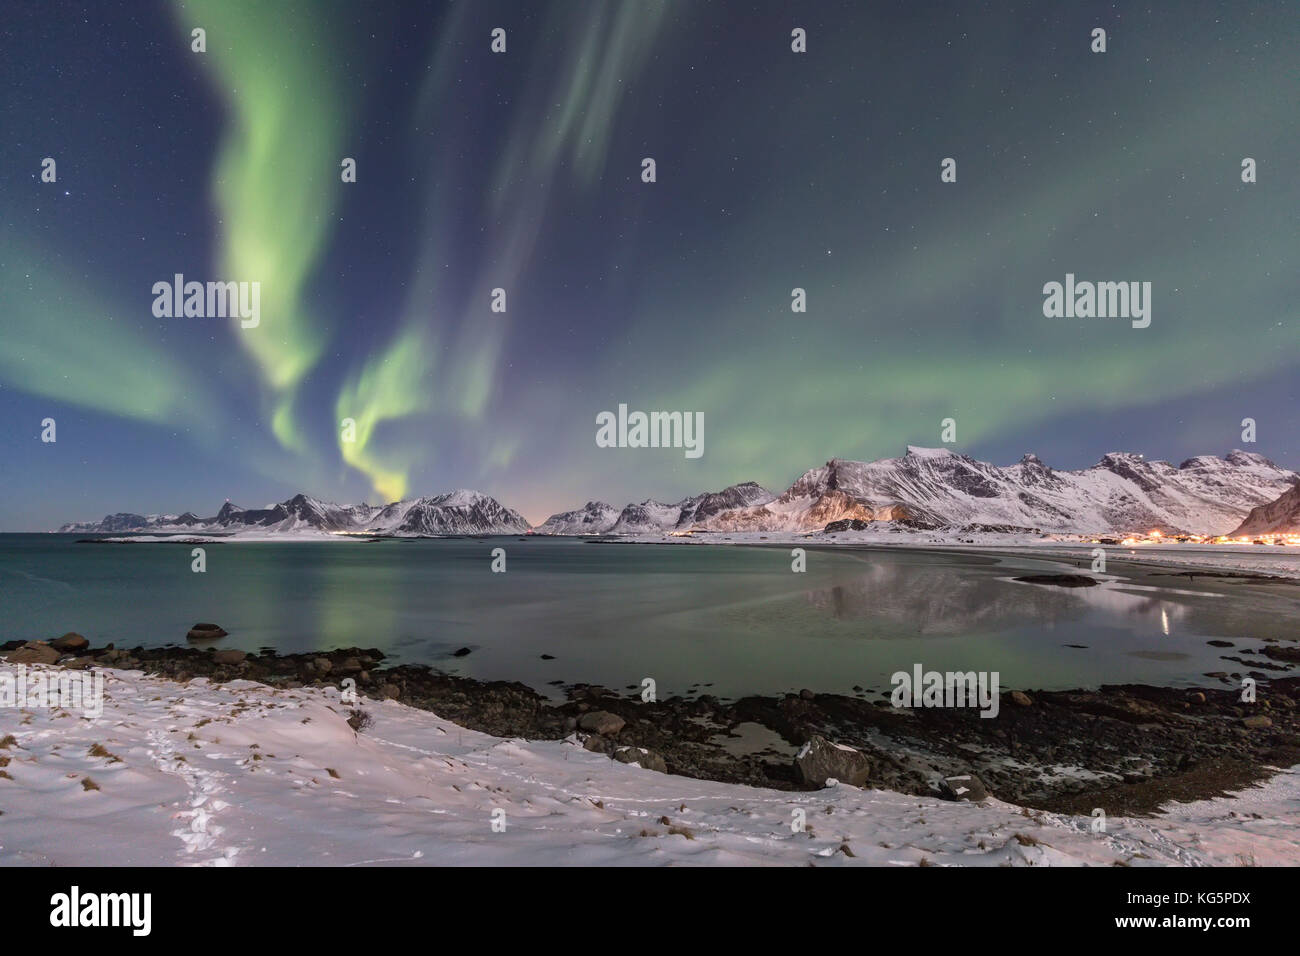 Northern light in Lofoten Islands, Norway - Stock Image